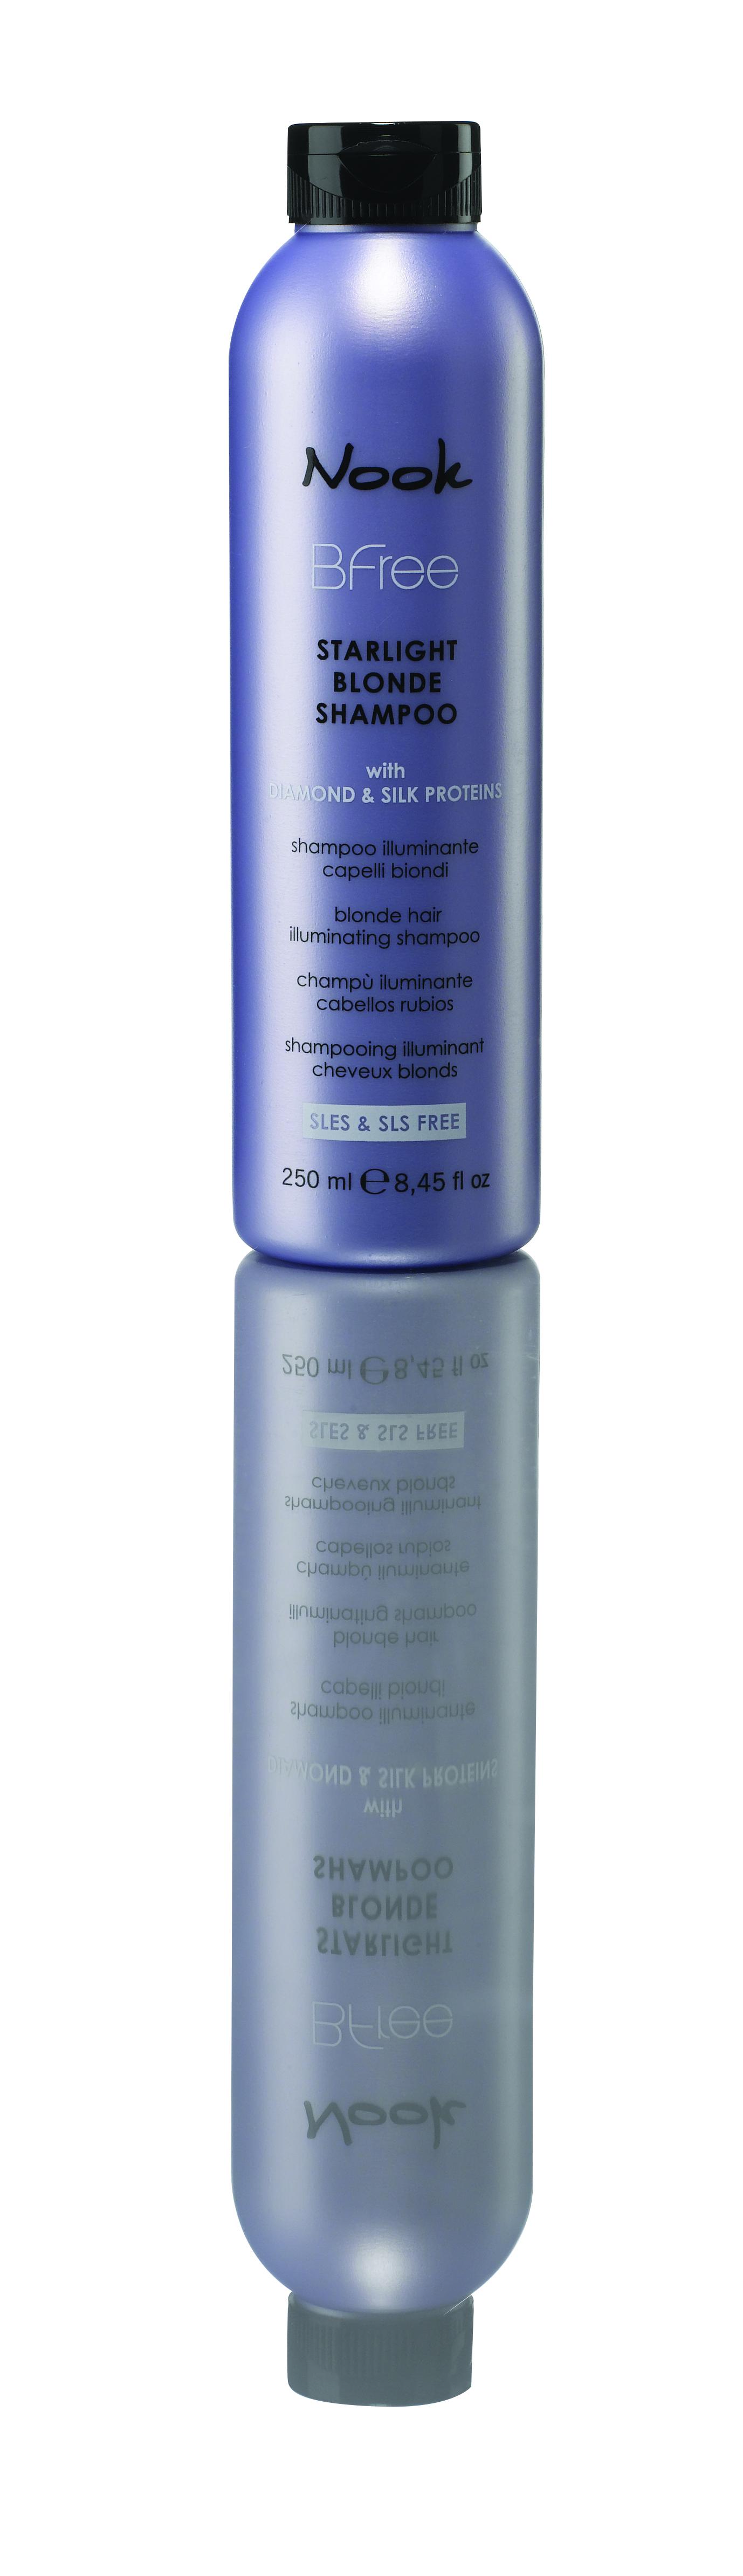 NOOK Шампунь сияющий для волос цвета блонд / Starlight Blonde Shampoo BFREE 250мл шампунь nook starlight blonde shampoo